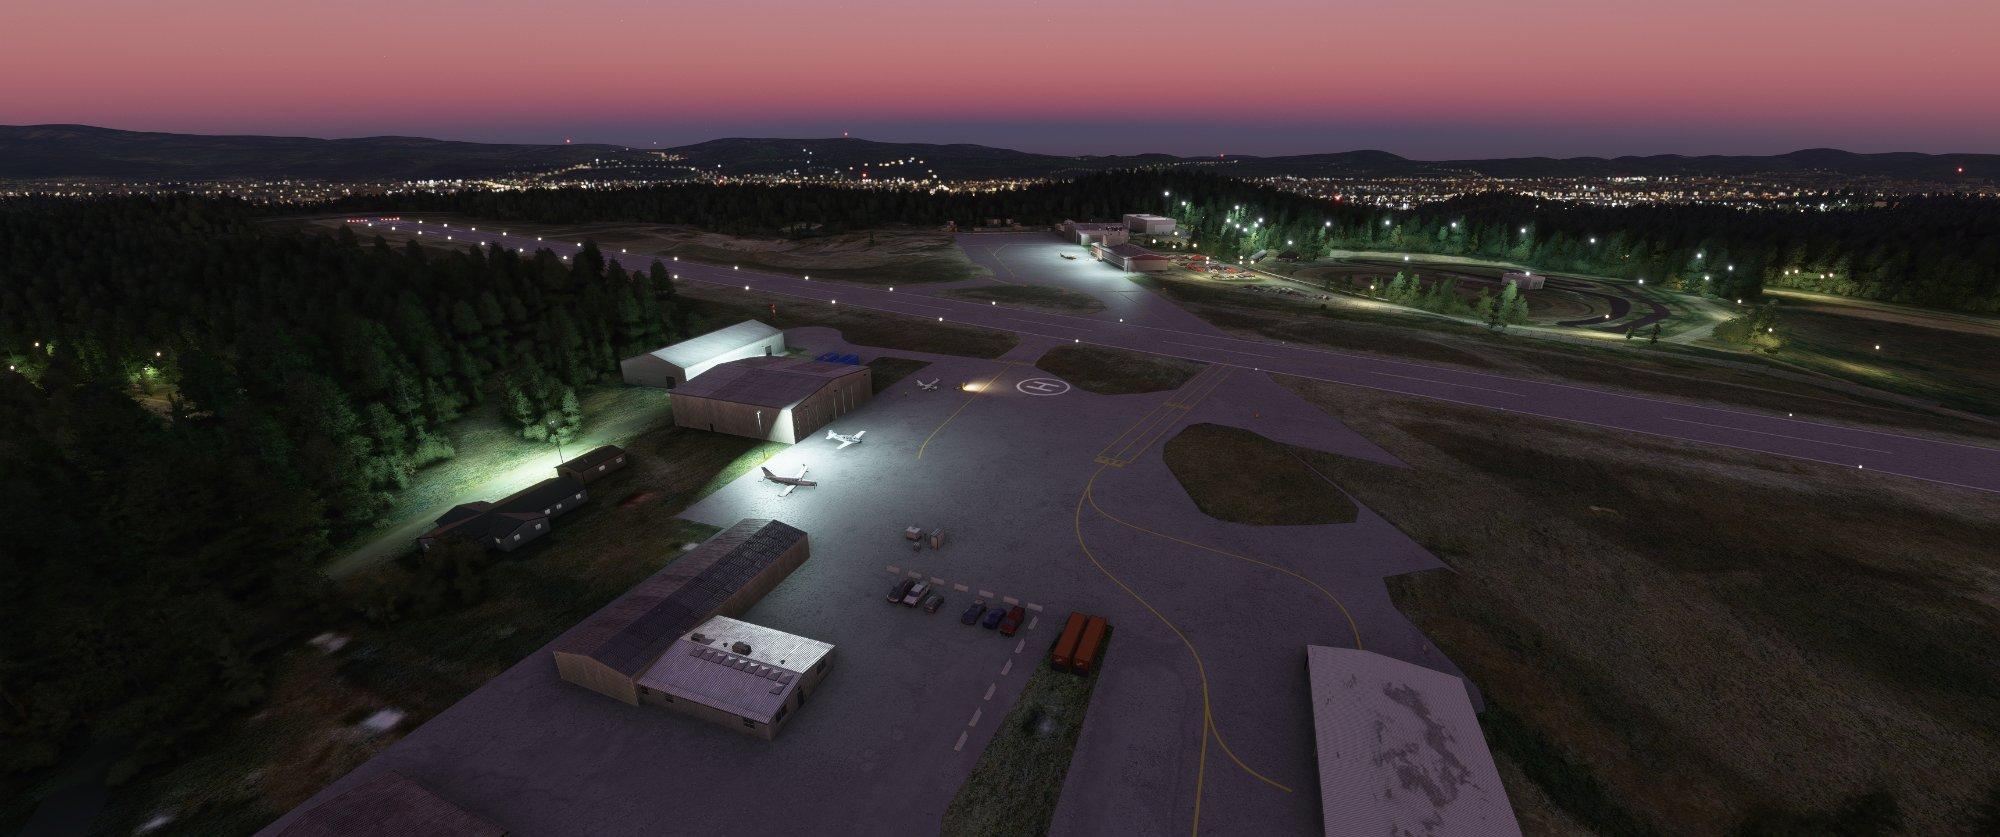 Microsoft Flight Simulator Screenshot 2020.10.30 - 16.27.09.78.jpg